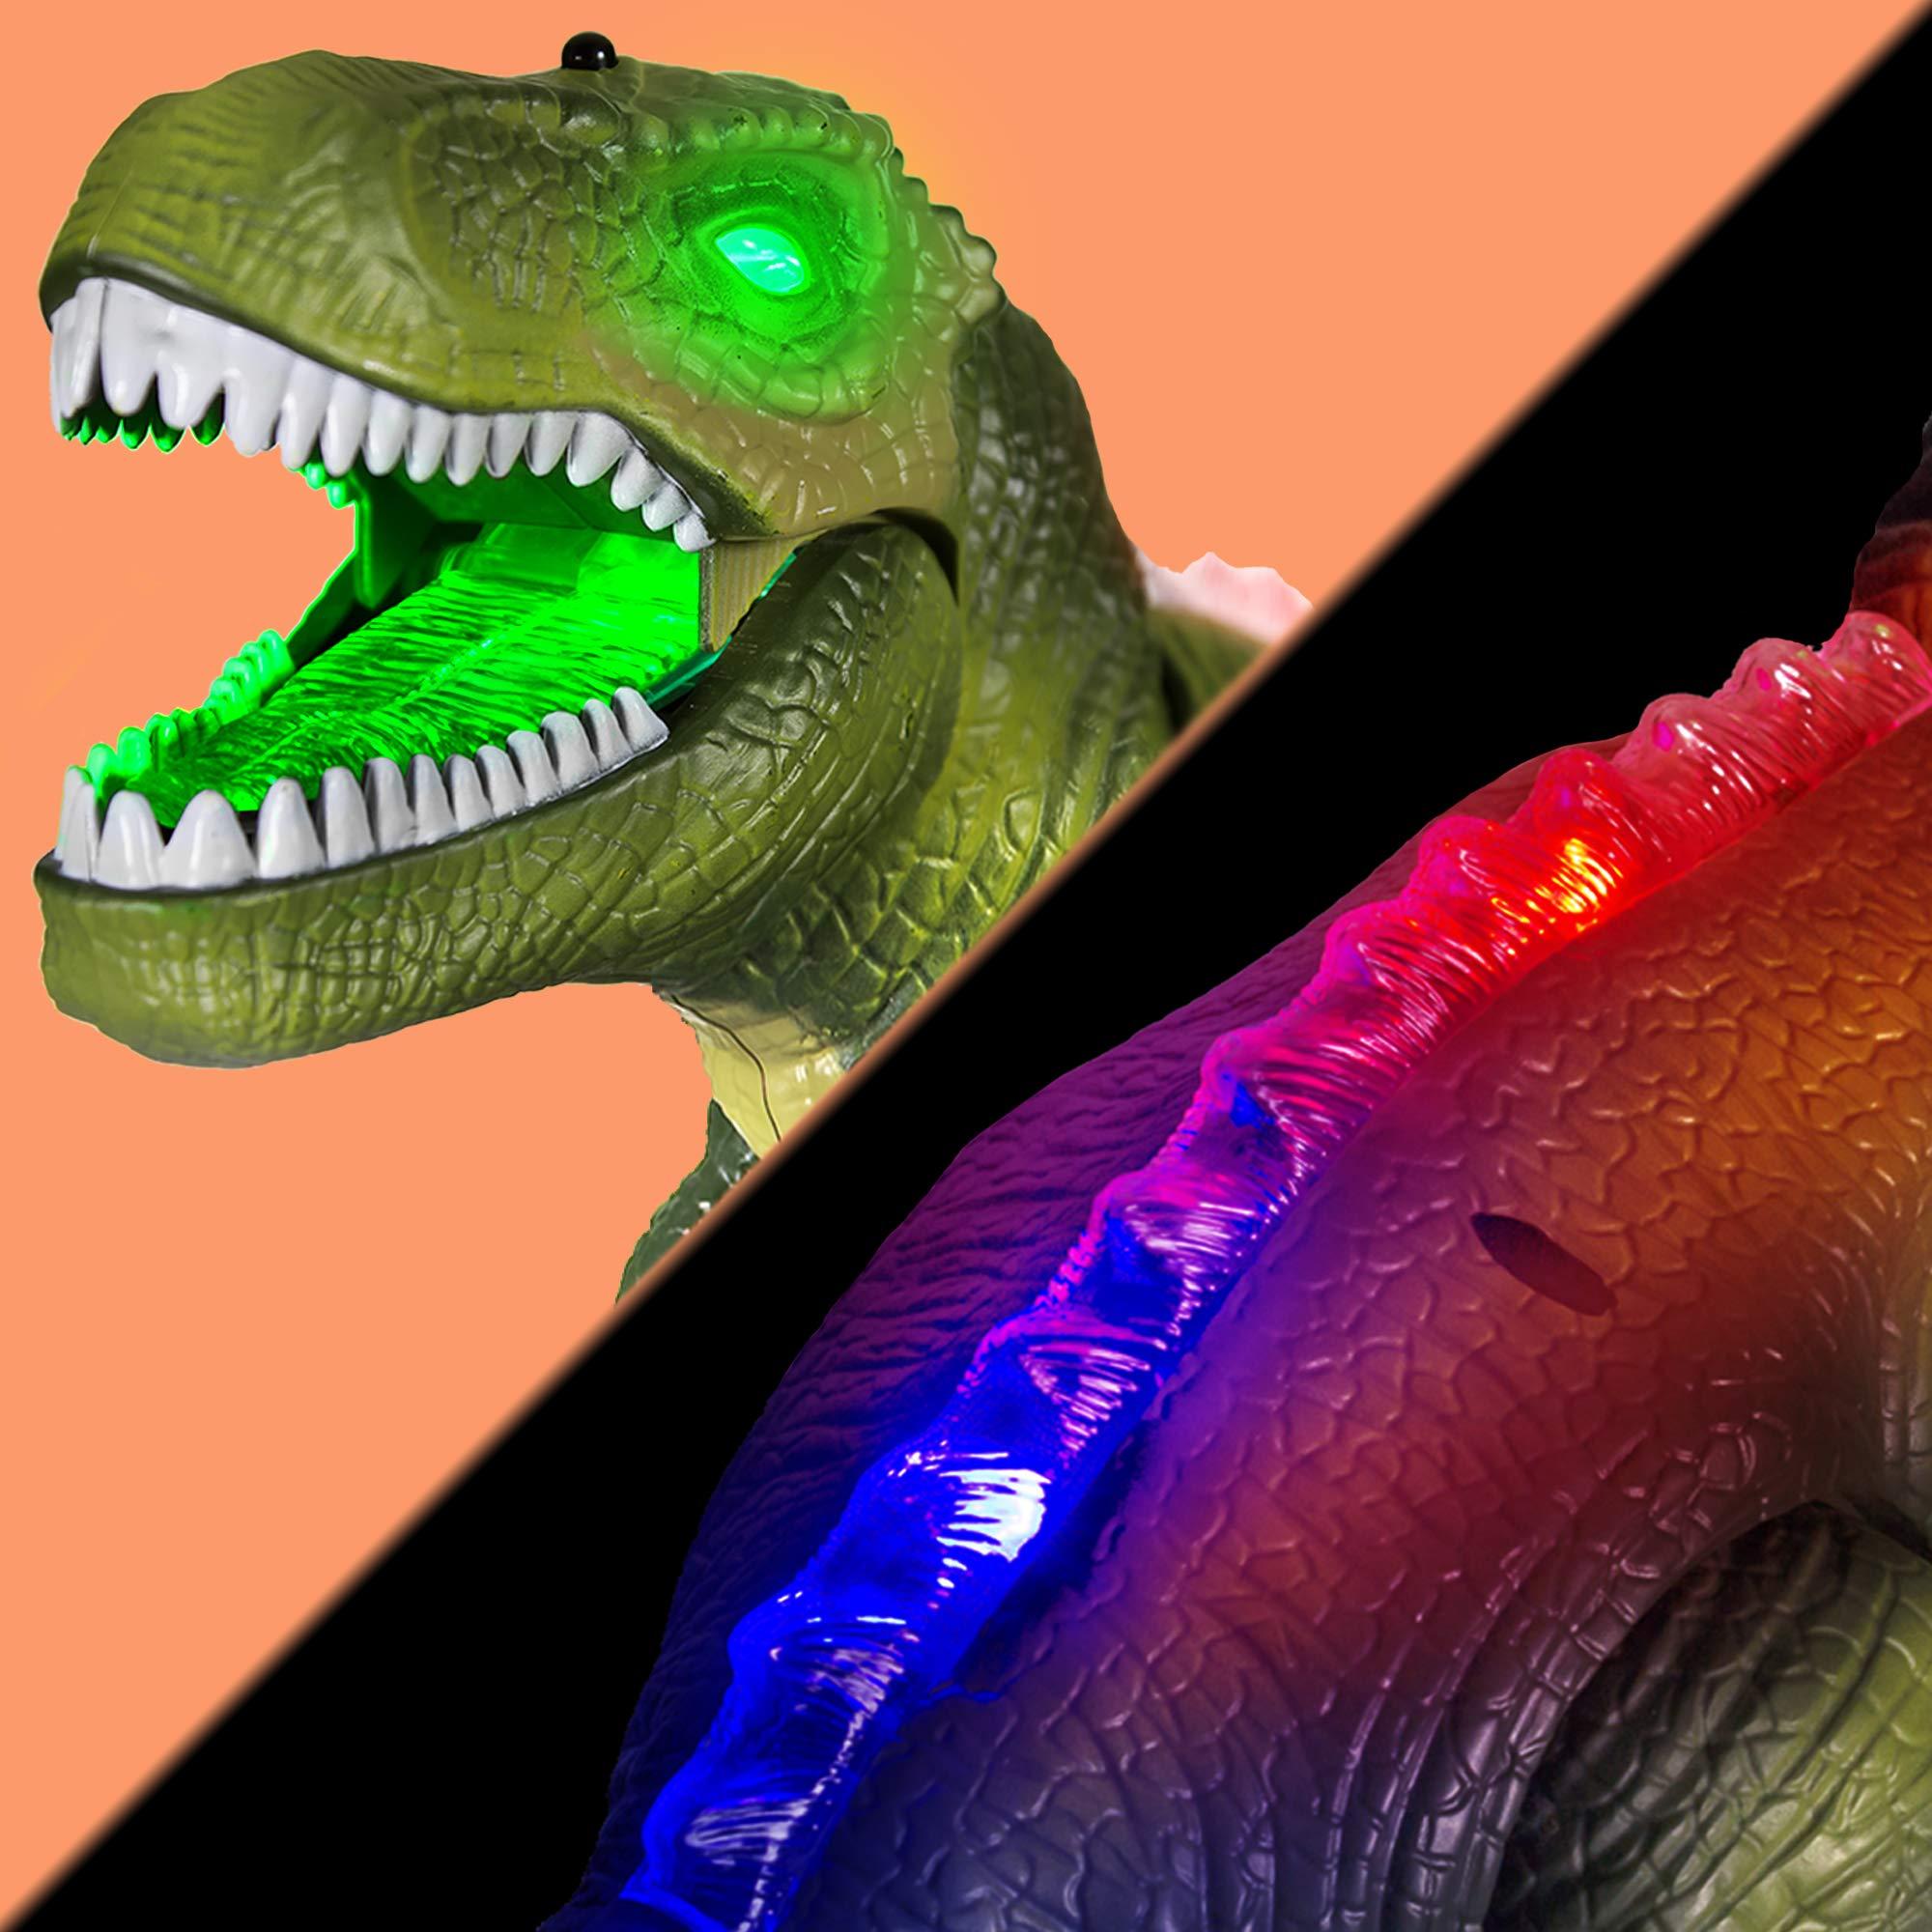 Windy City Novelties Led Light-Up Walking & Roaring T-Rex Dinosaur Toys for Boys & Girls (T-Rex with Remote) by Windy City Novelties (Image #3)